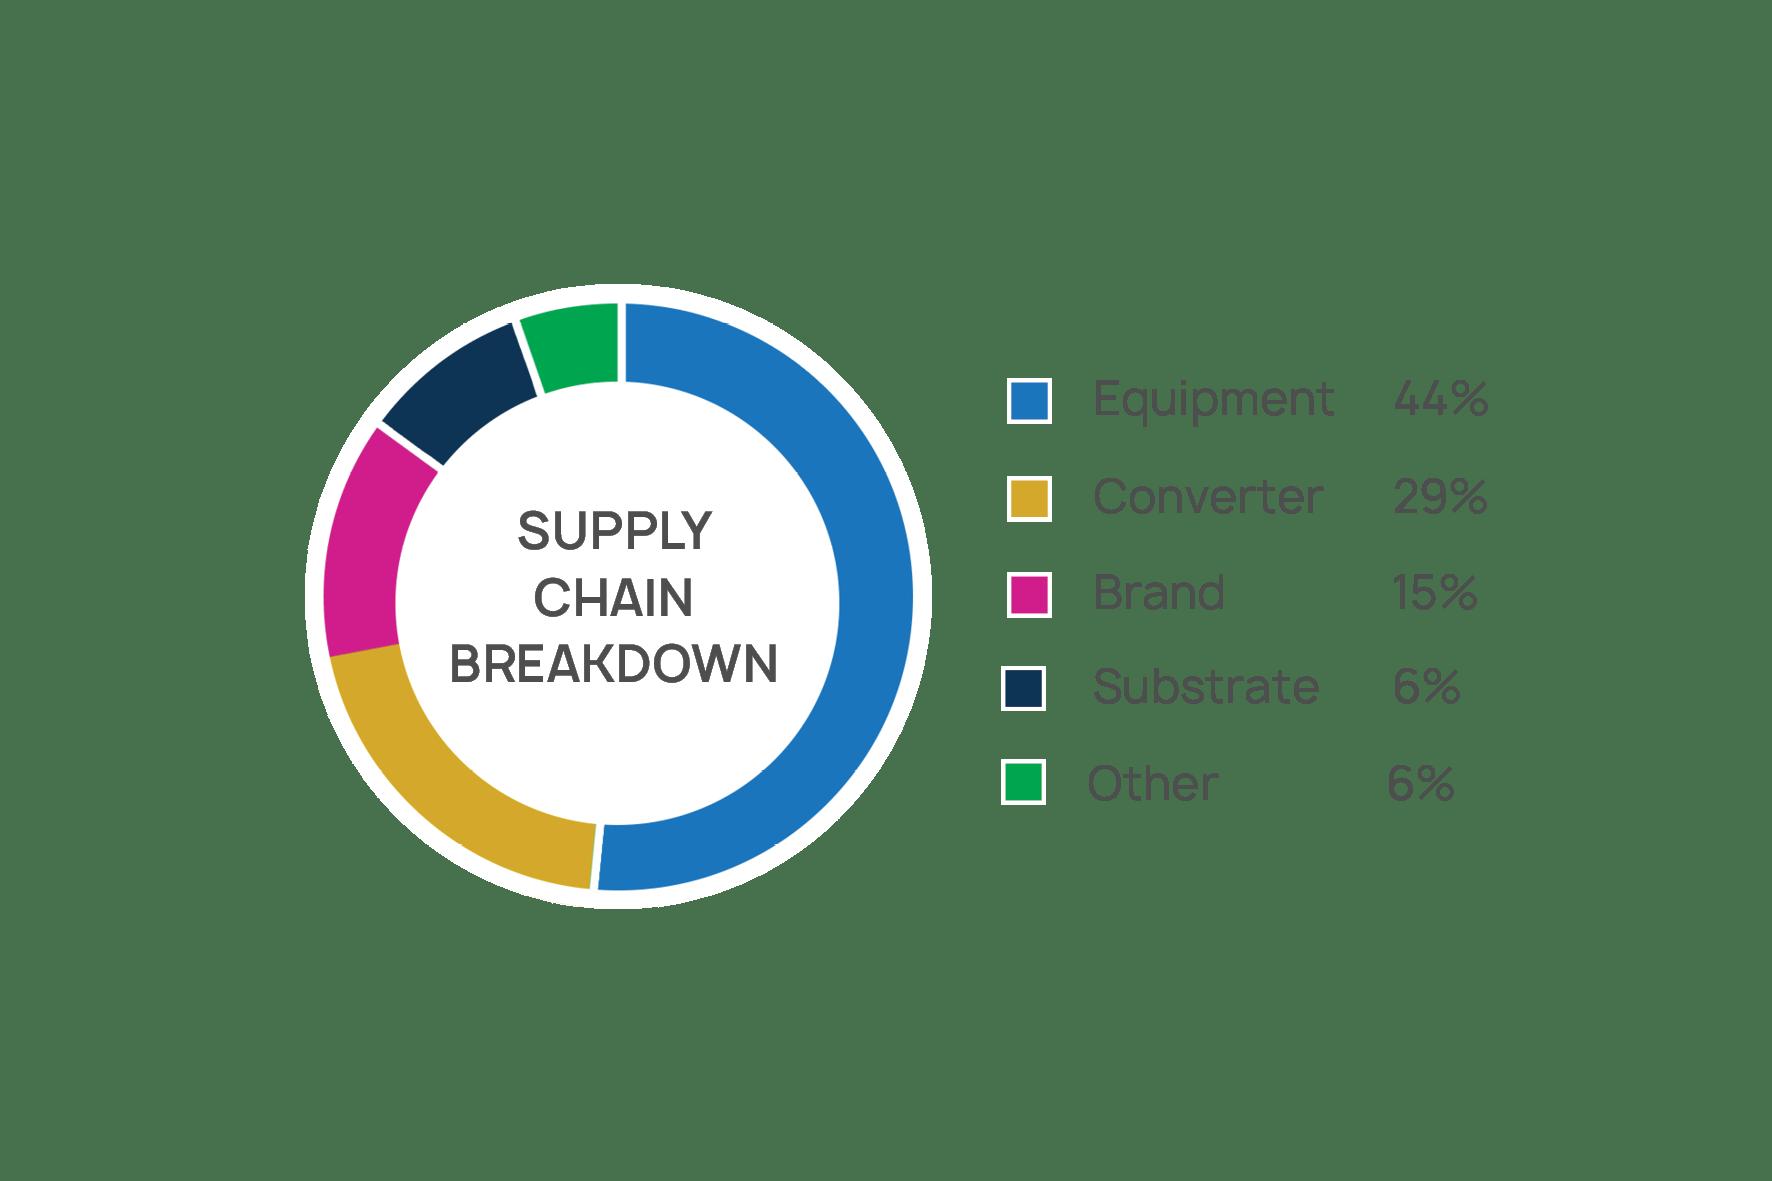 Supply-Chain-Breakdown